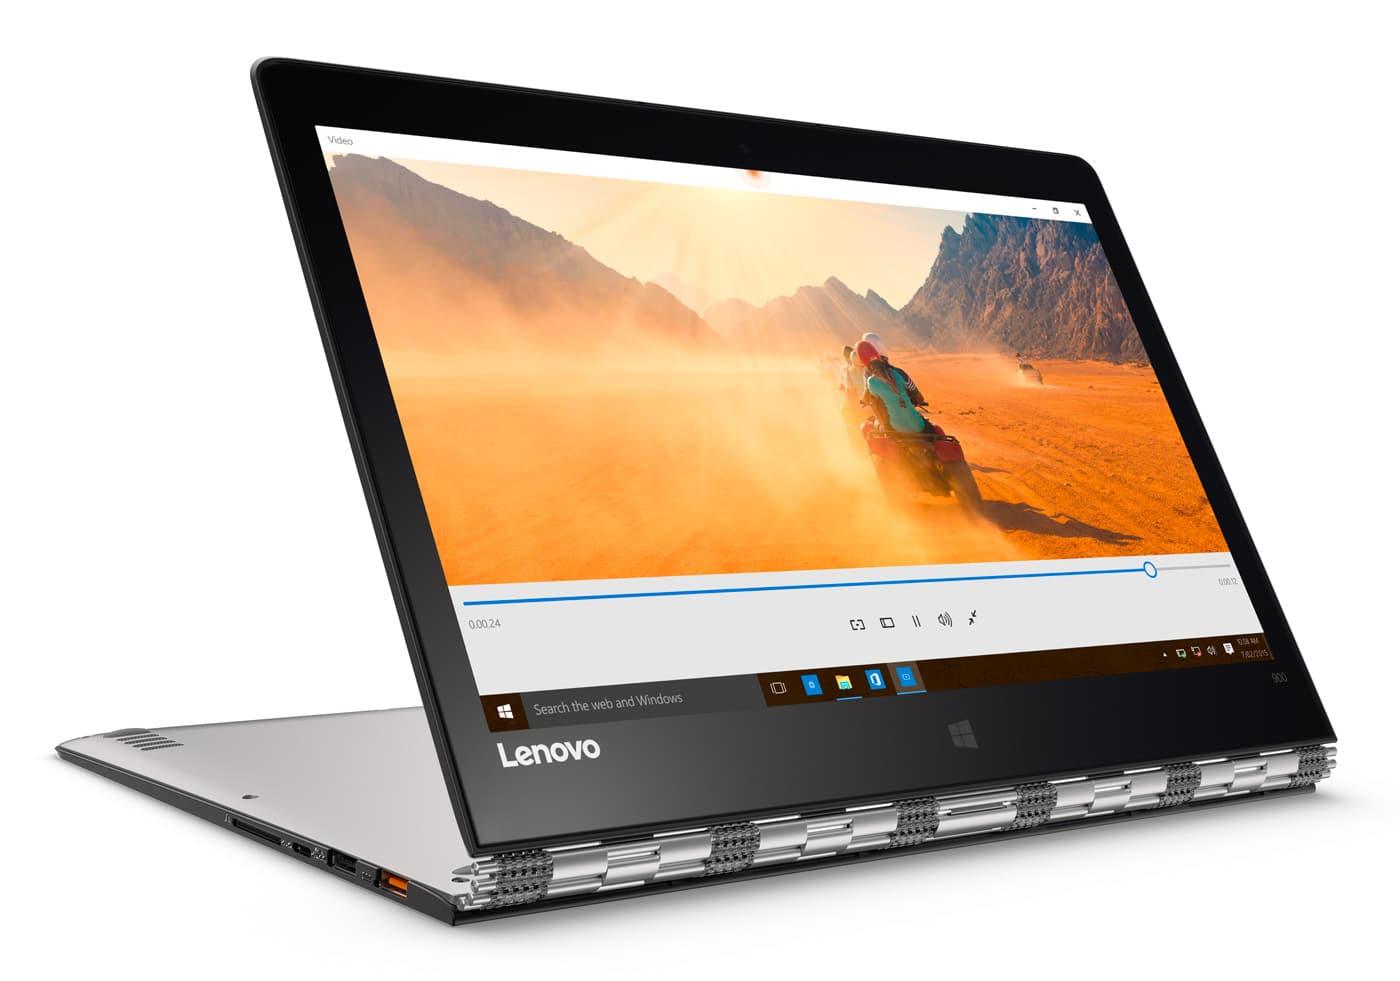 "<span class=""toptagtitre"">Promo 1140€ ! </span>Lenovo Yoga 900-13ISK2, 13 pouces QHD+ tactile SSD 512 Go i7"